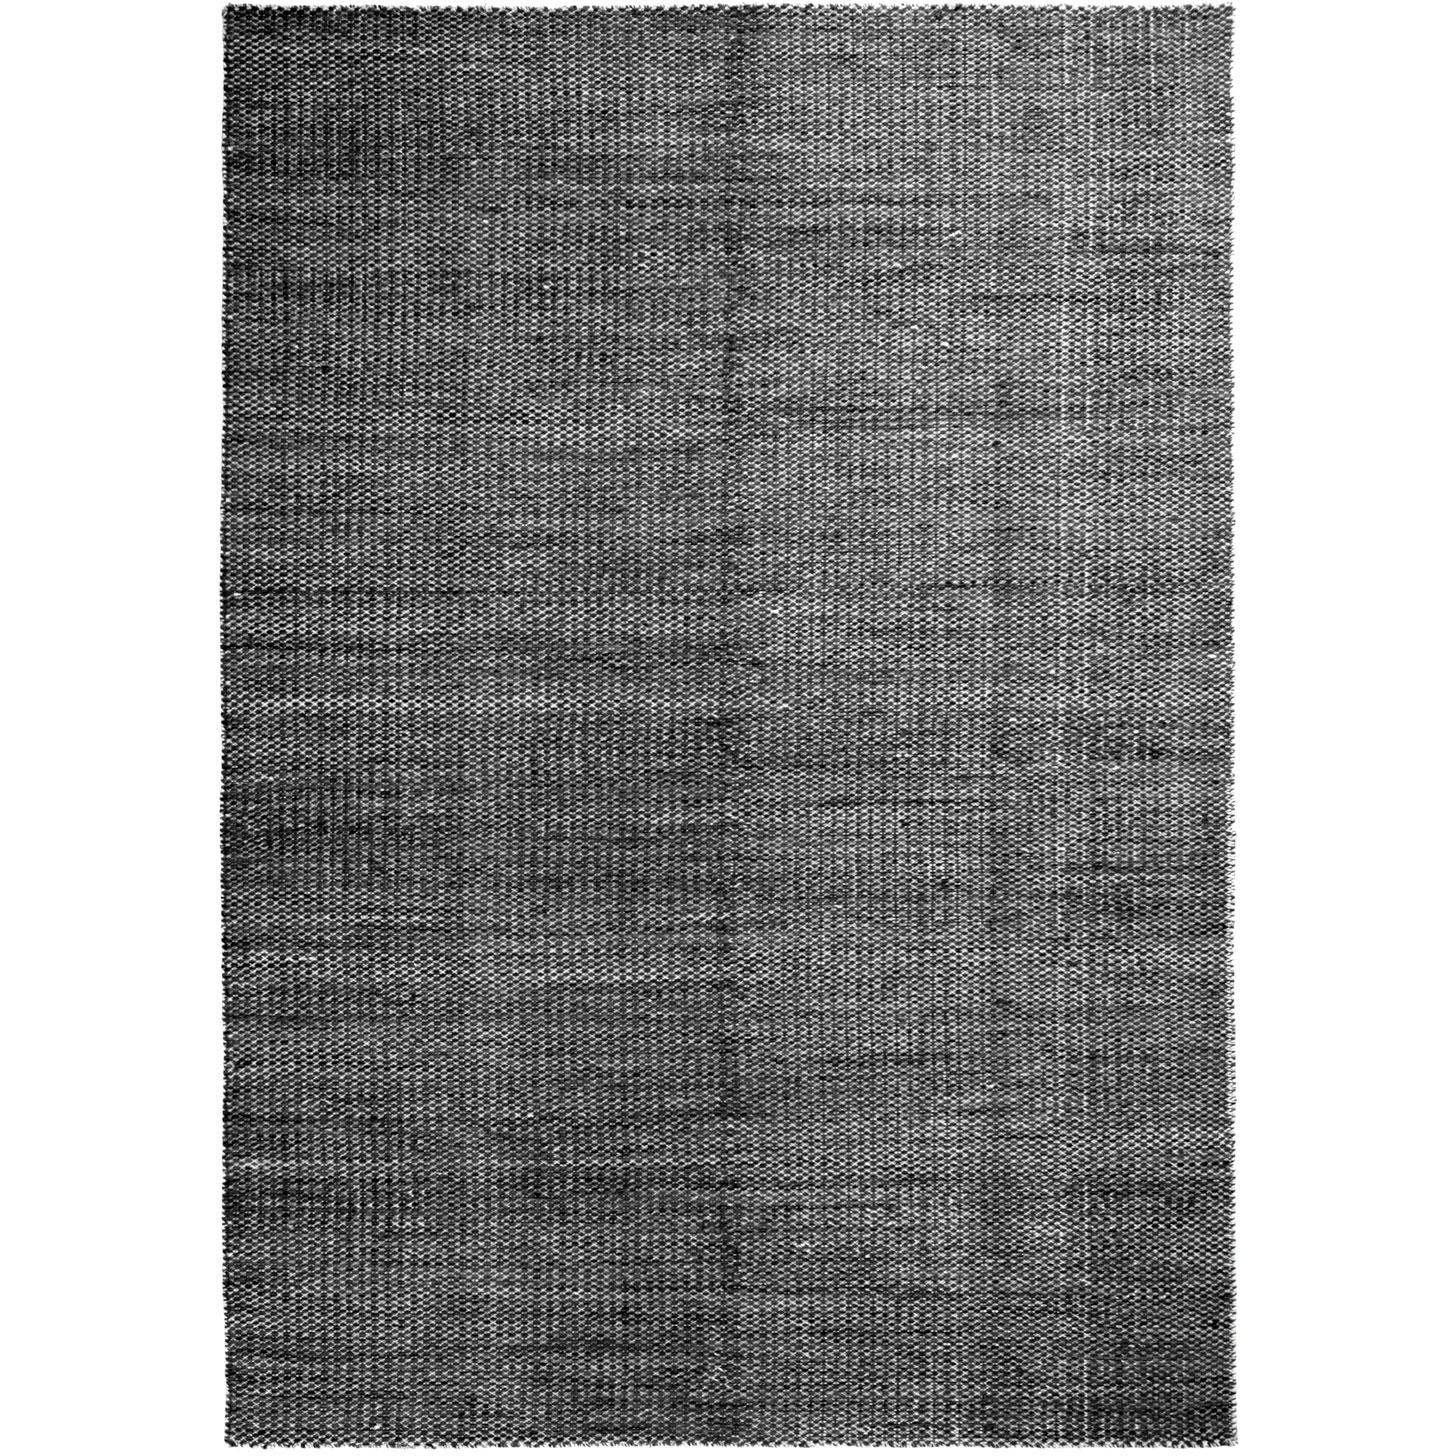 Moiré Kelim Matta 170x240 cm, Svart